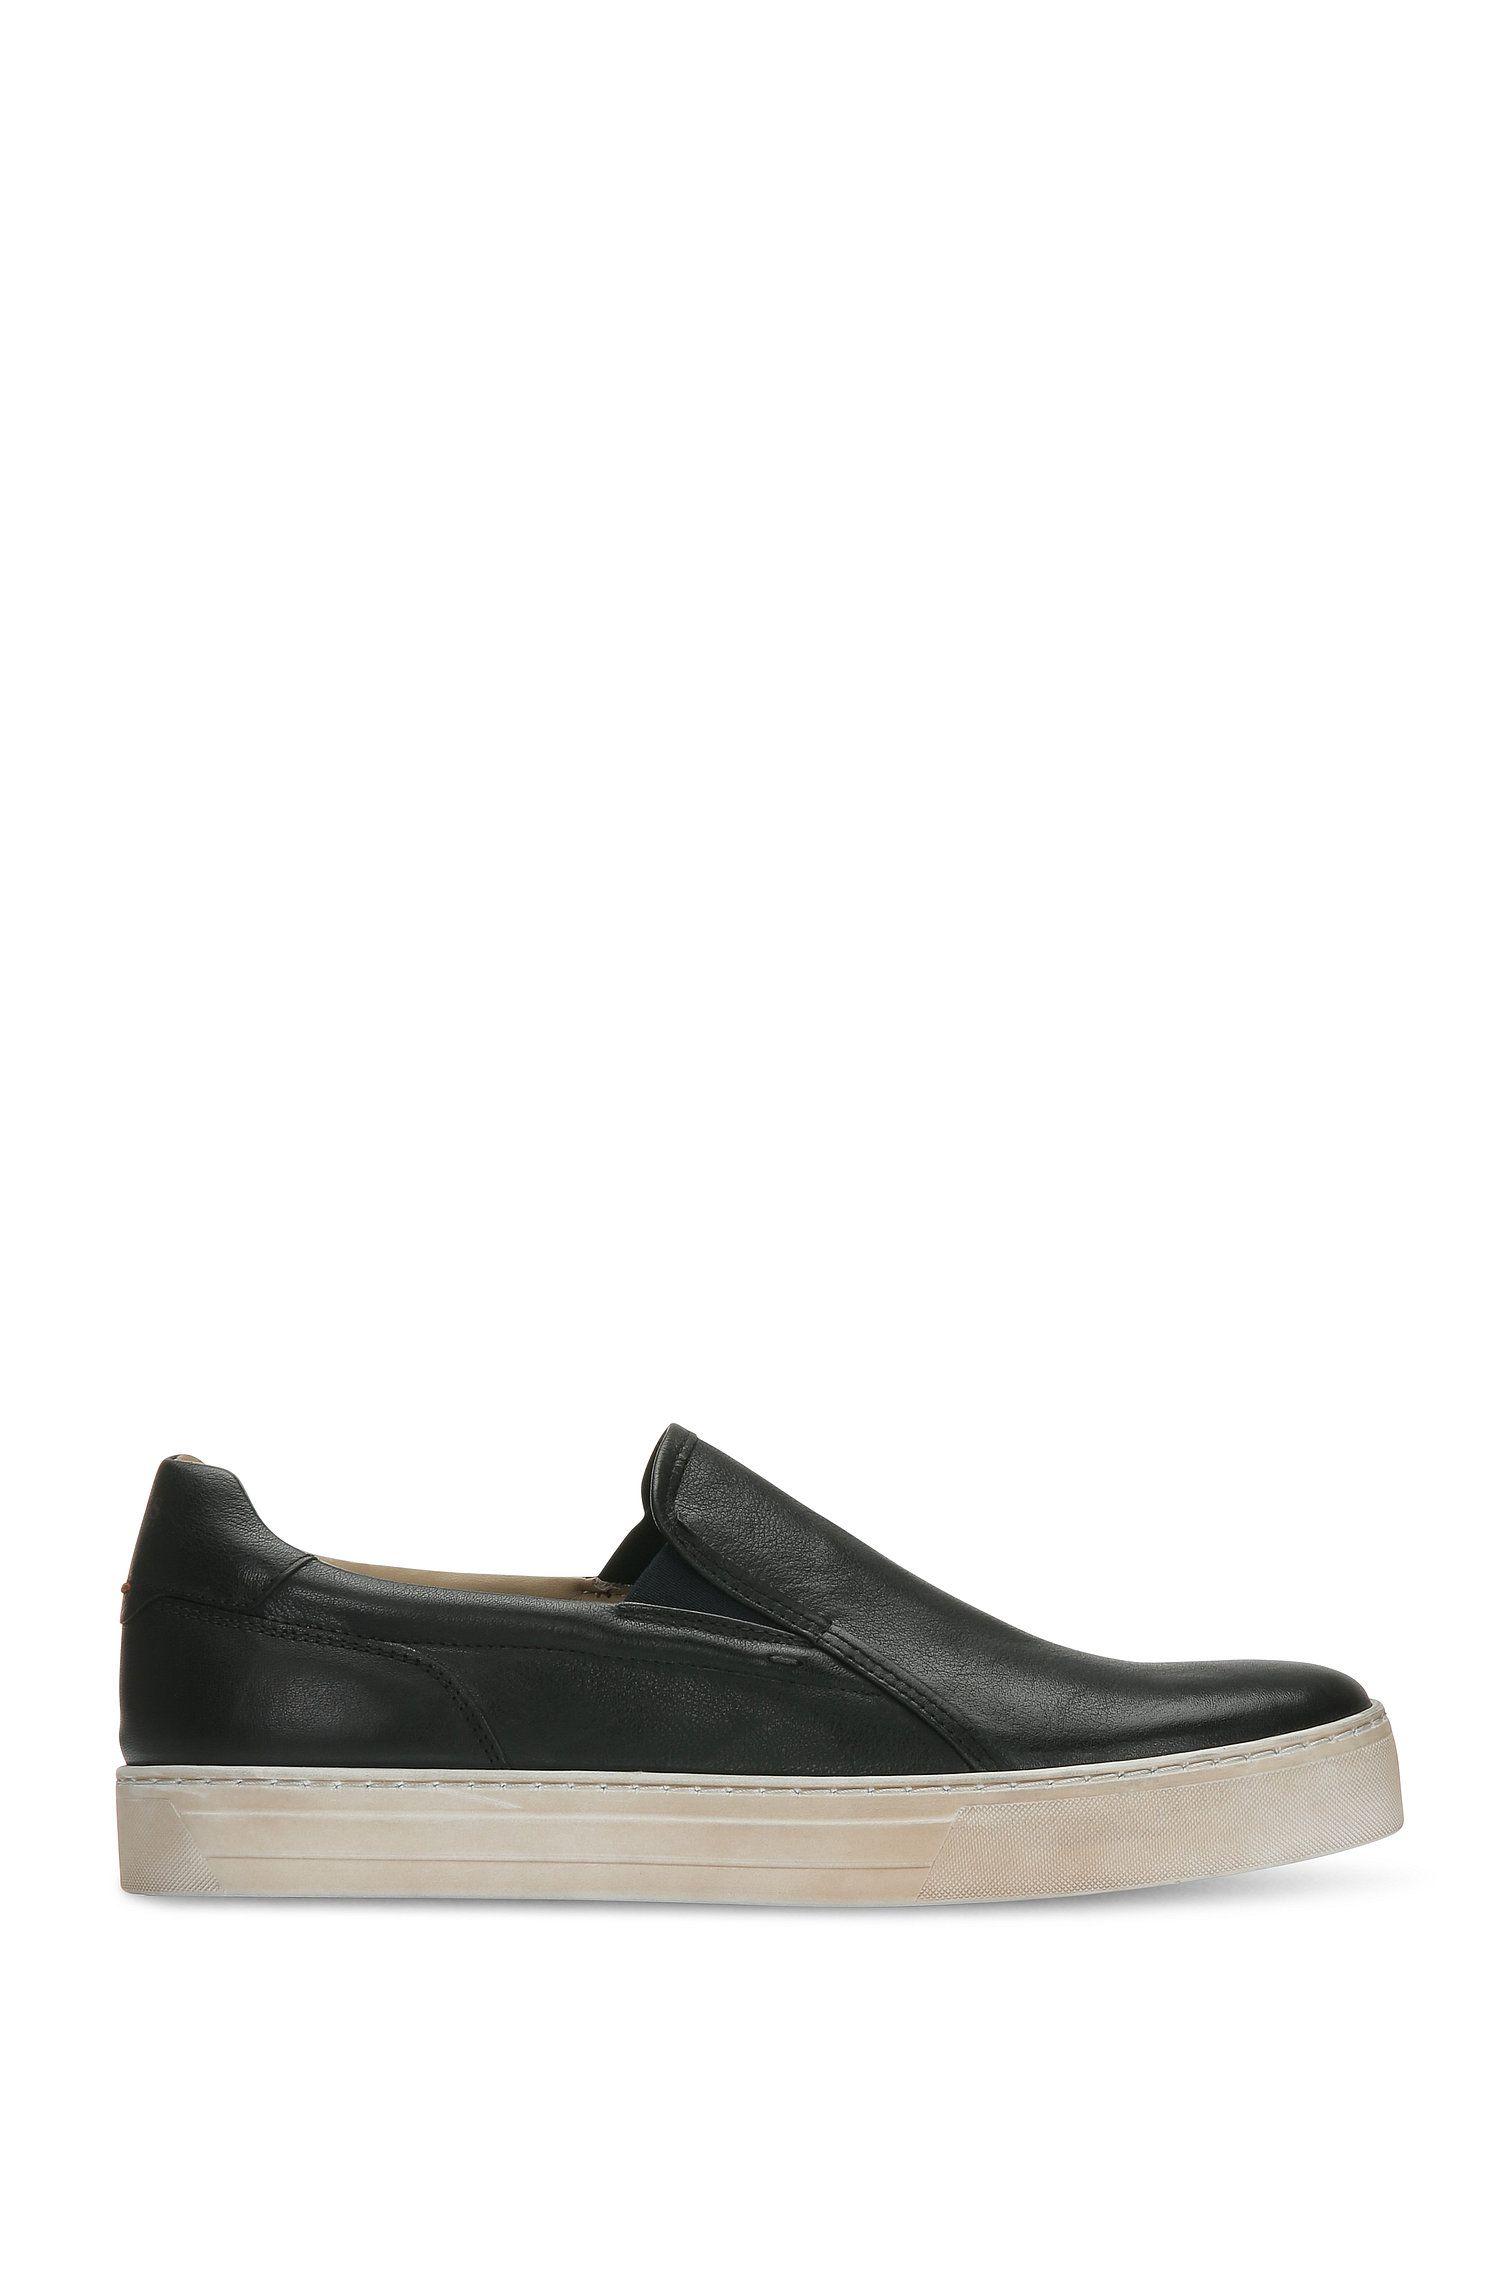 Lederne Slip-on Sneakers mit Vintage-Effekt: ´Noir_Slon_ltws`